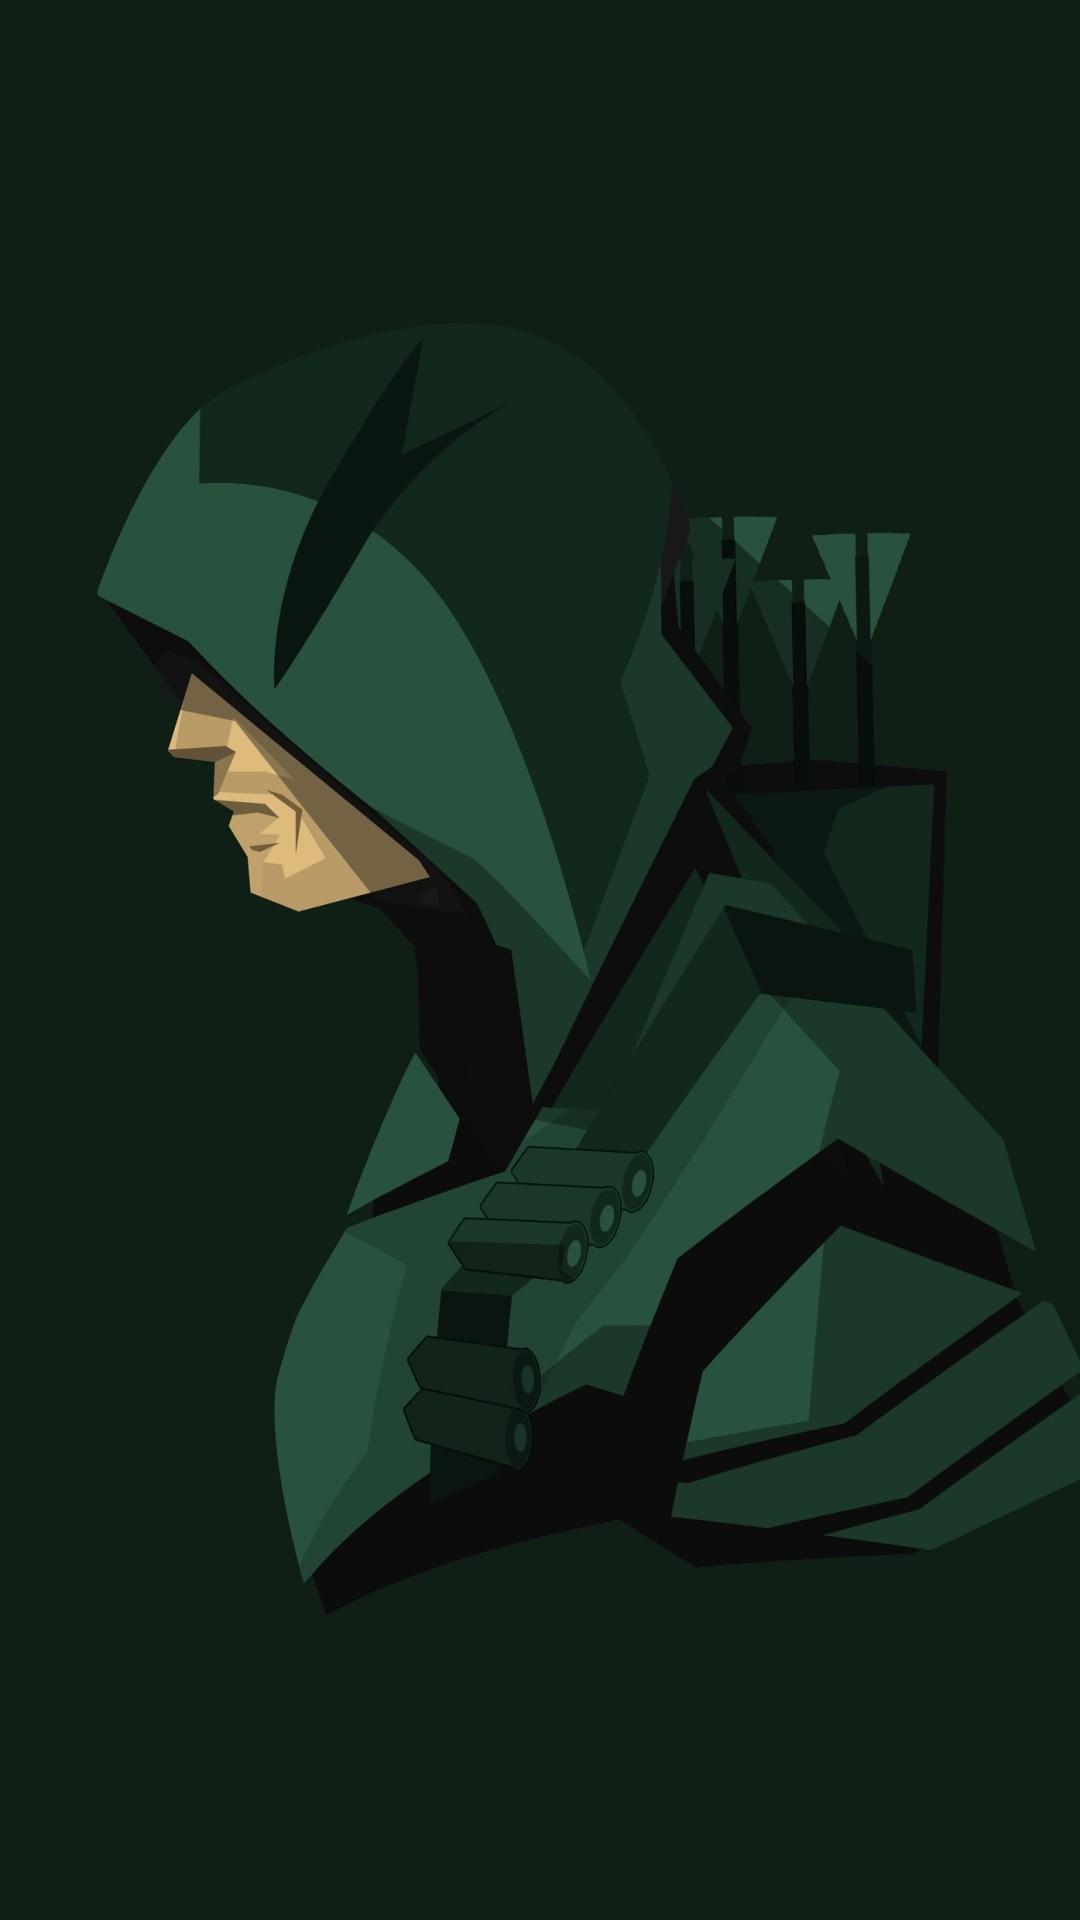 Green Arrow iPhone 5 wallpaper